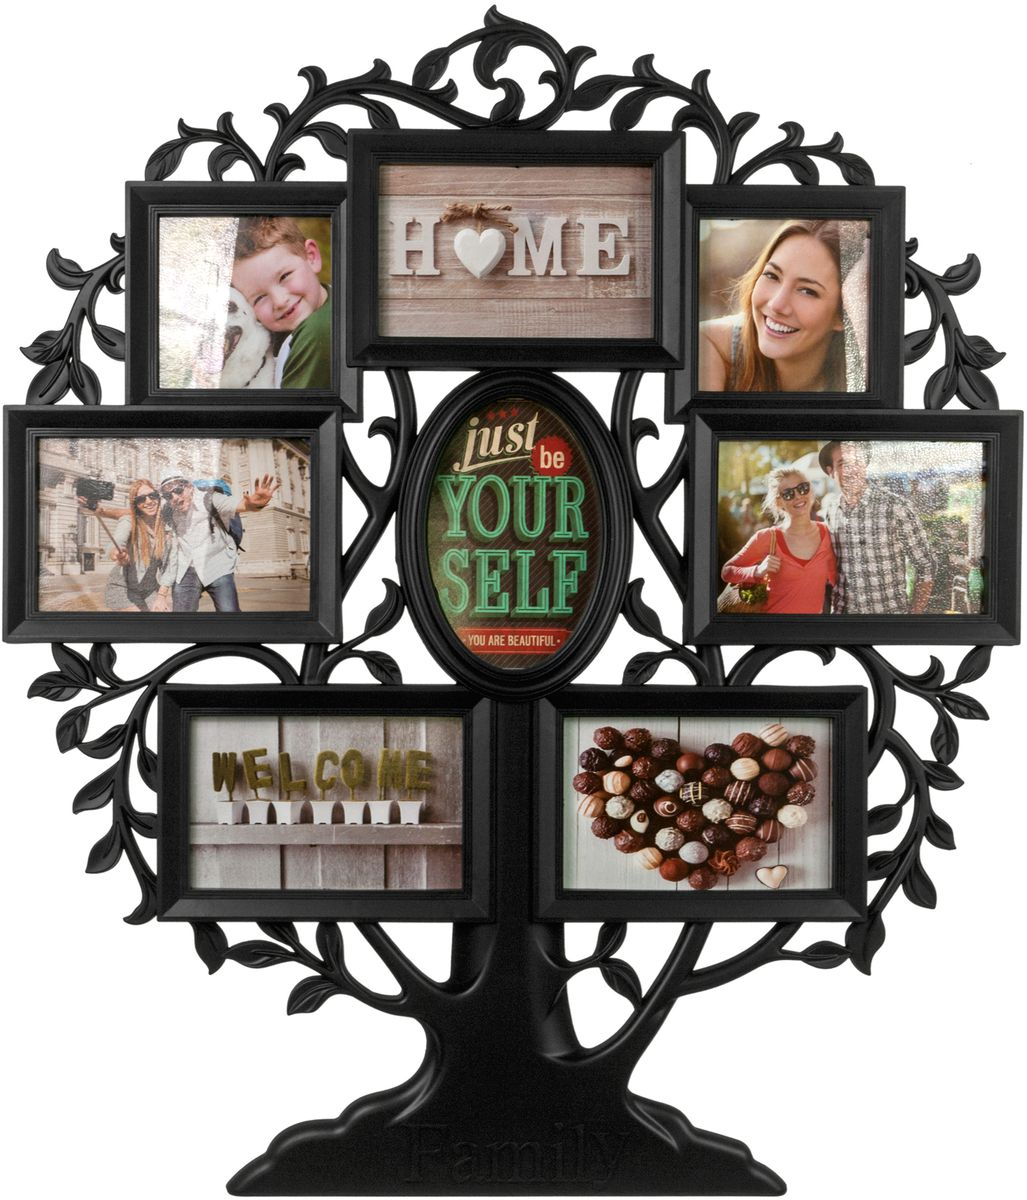 Фоторамка Platinum Родословное дерево. Family, цвет: черный, на 8 фото. BIN-1124063-B